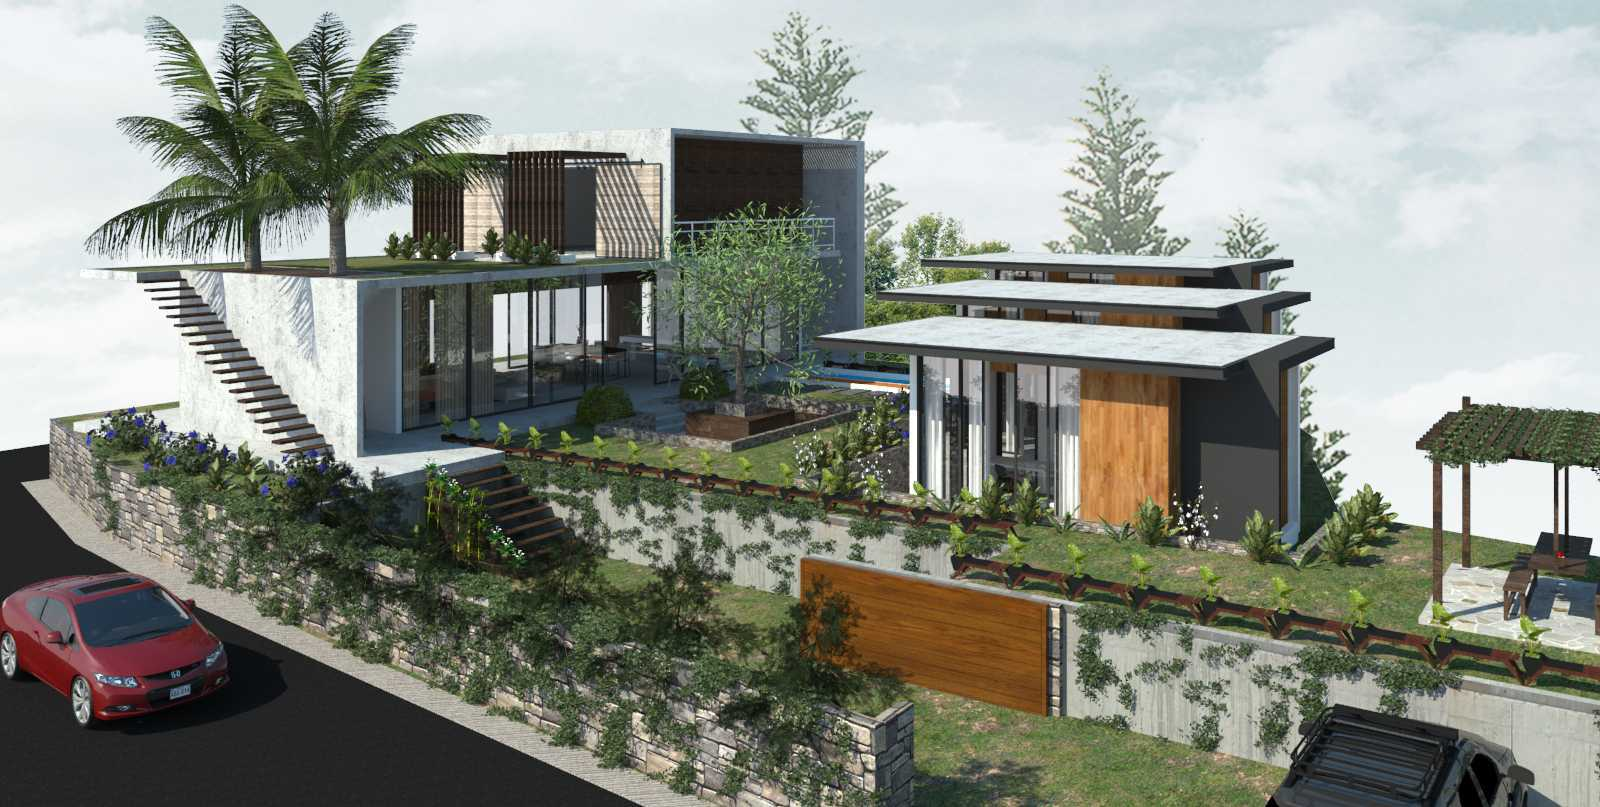 Archid Design&build Cj Villa Cijeruk, Kec. Cijeruk, Bogor, Jawa Barat, Indonesia Cijeruk, Kec. Cijeruk, Bogor, Jawa Barat, Indonesia Archid-Design-Build-Cj-Villa   87832